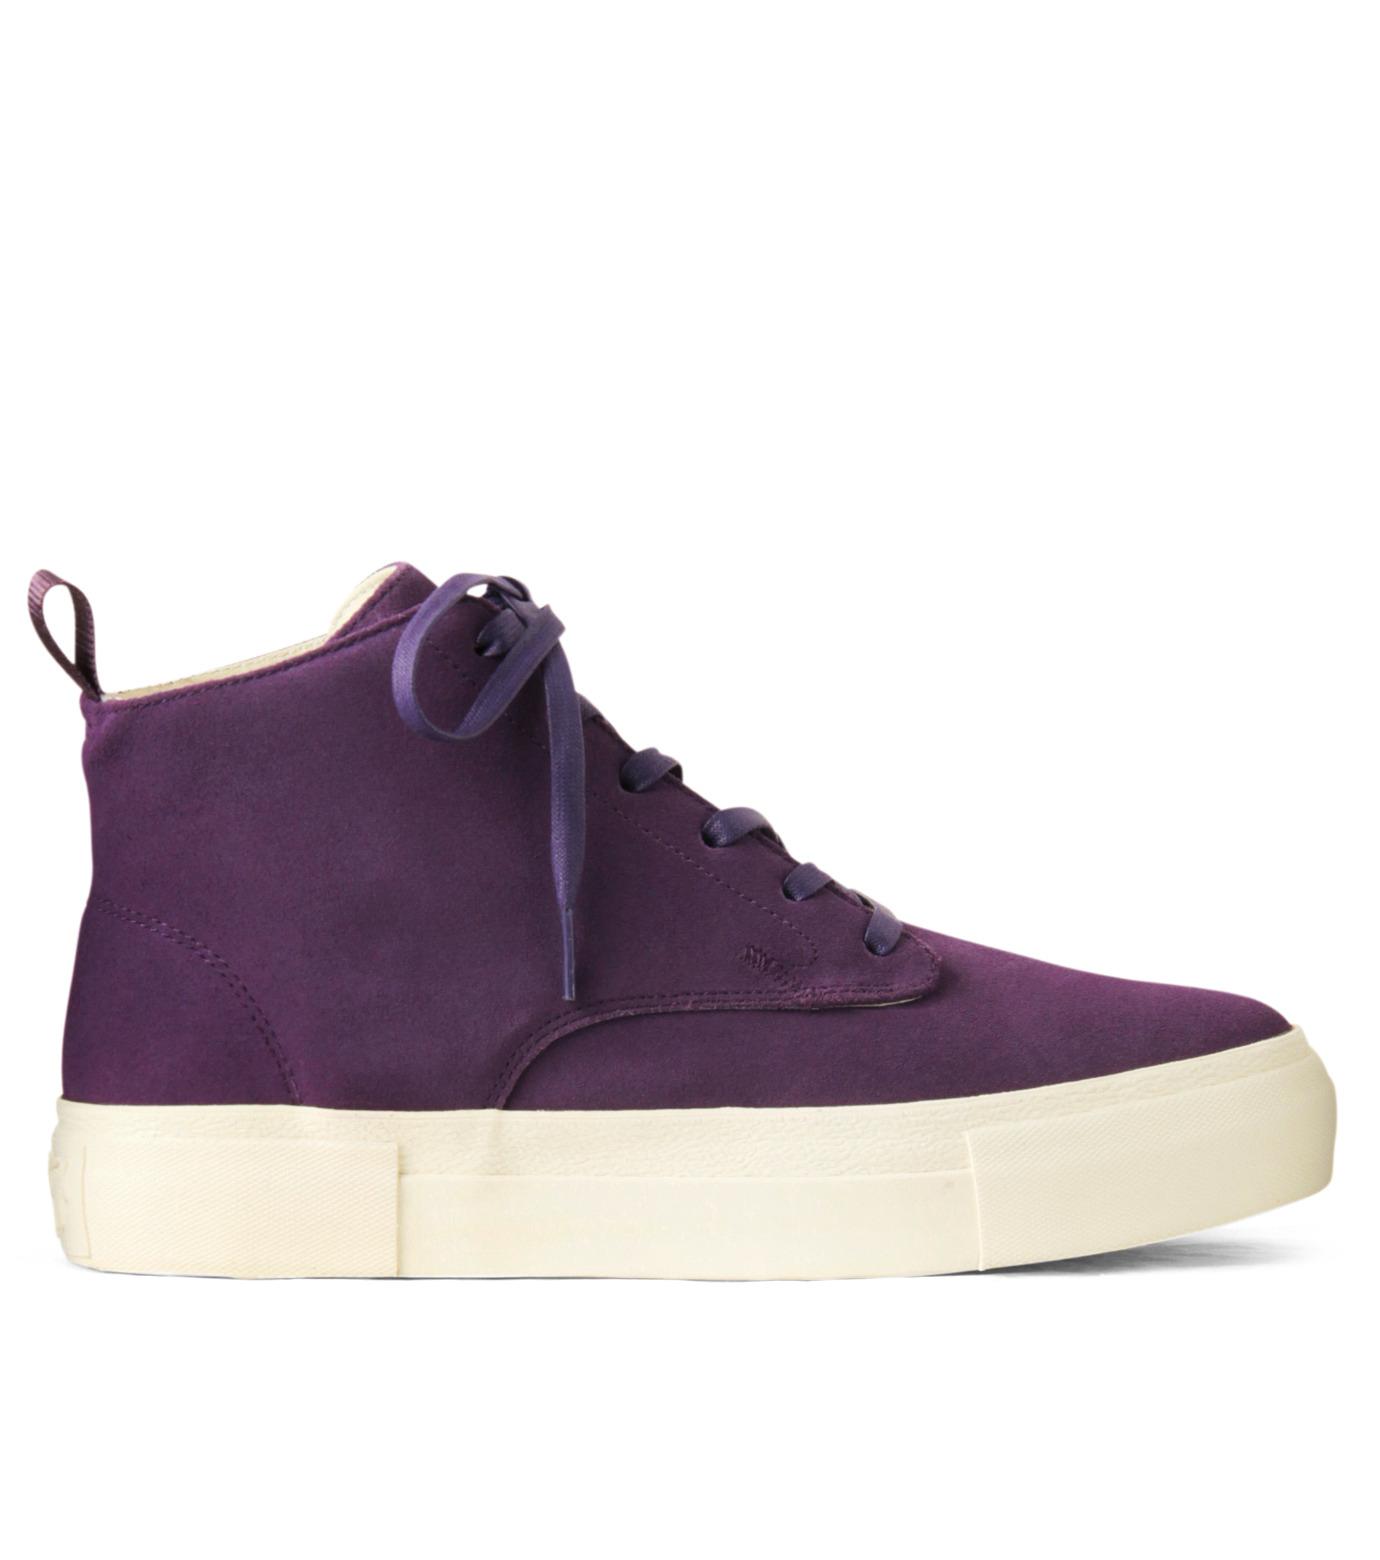 Eytys(エイティーズ)のSuedeHicutSneaker-PURPLE(スニーカー/sneaker)-ODYSSEY-SUE-82 拡大詳細画像1